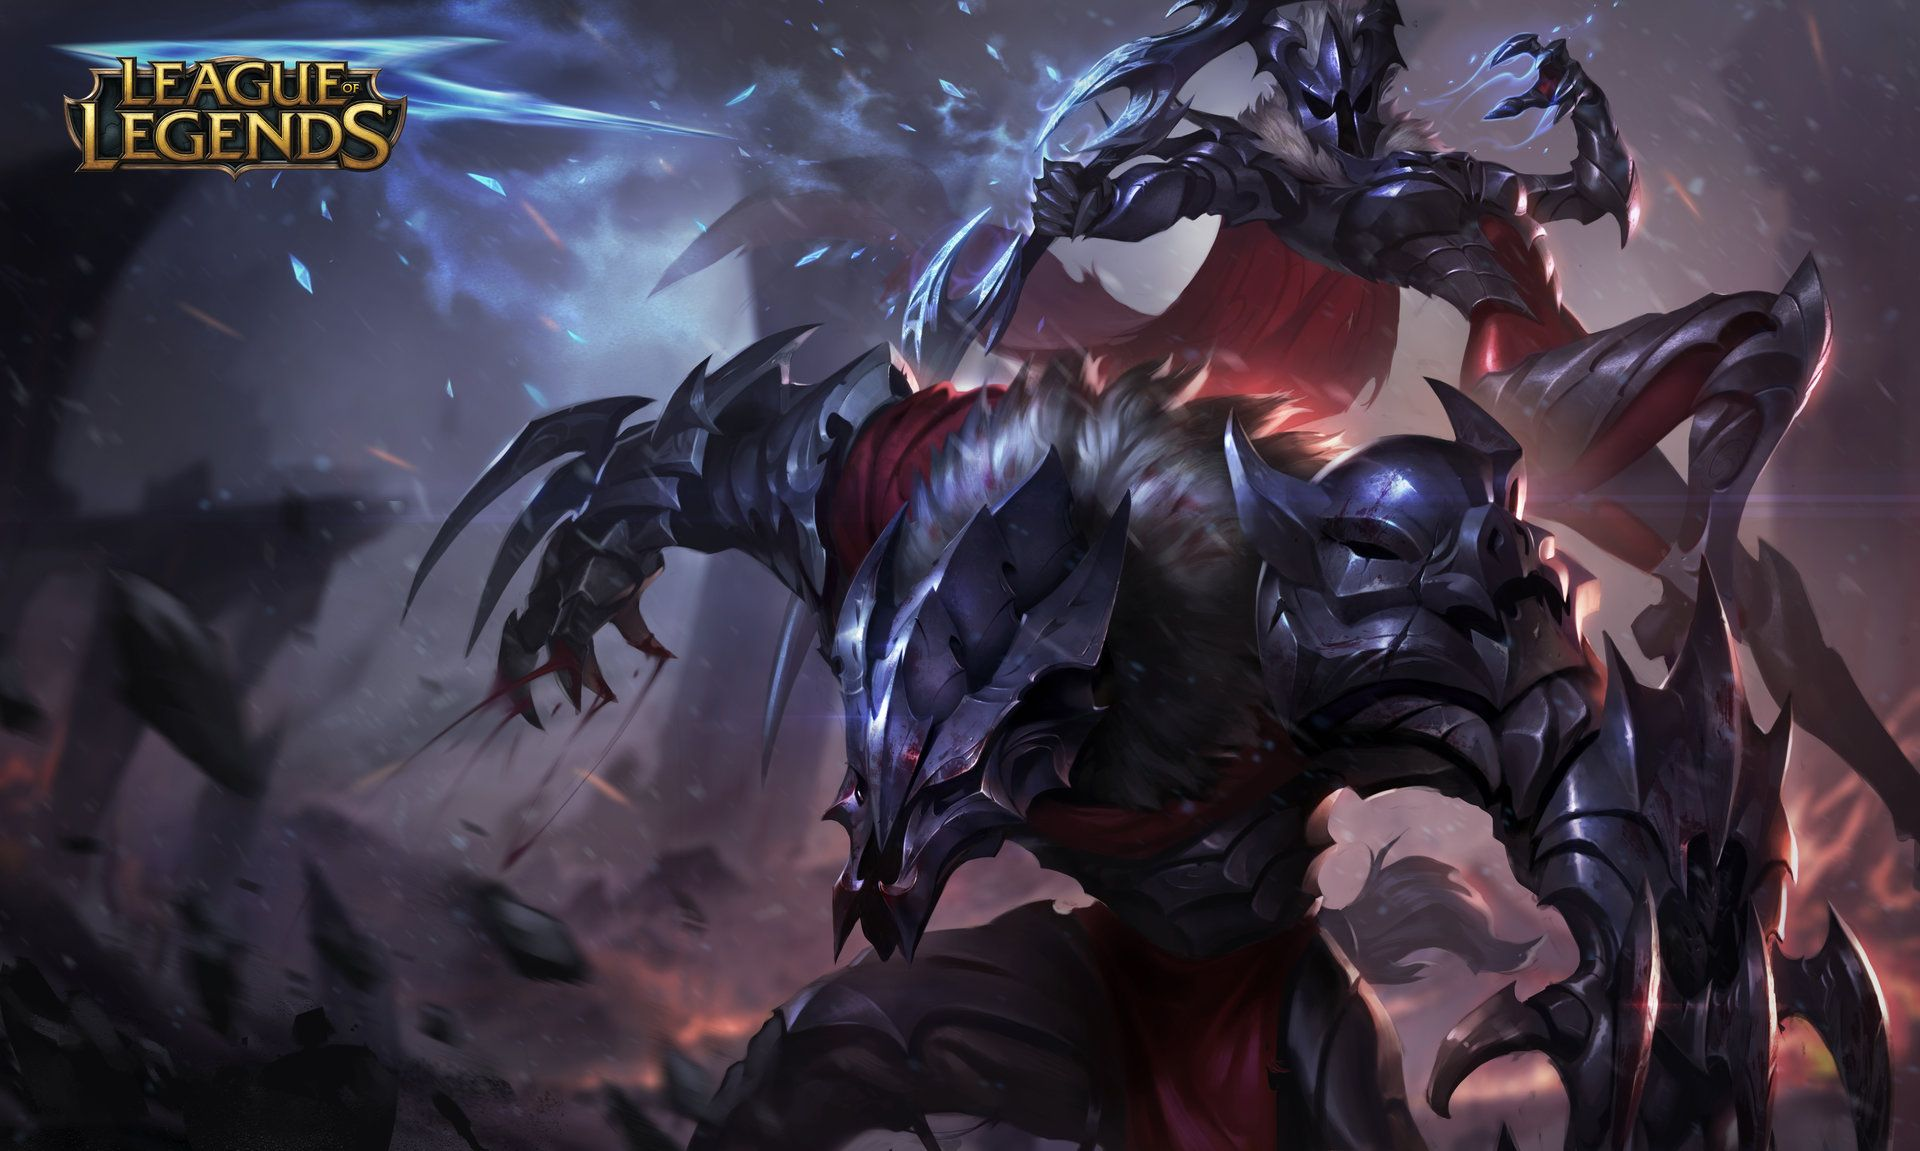 Marauder Skin For League Of Legends Chengwei Pan Lol League Of Legends Lol Champions League Of Legends